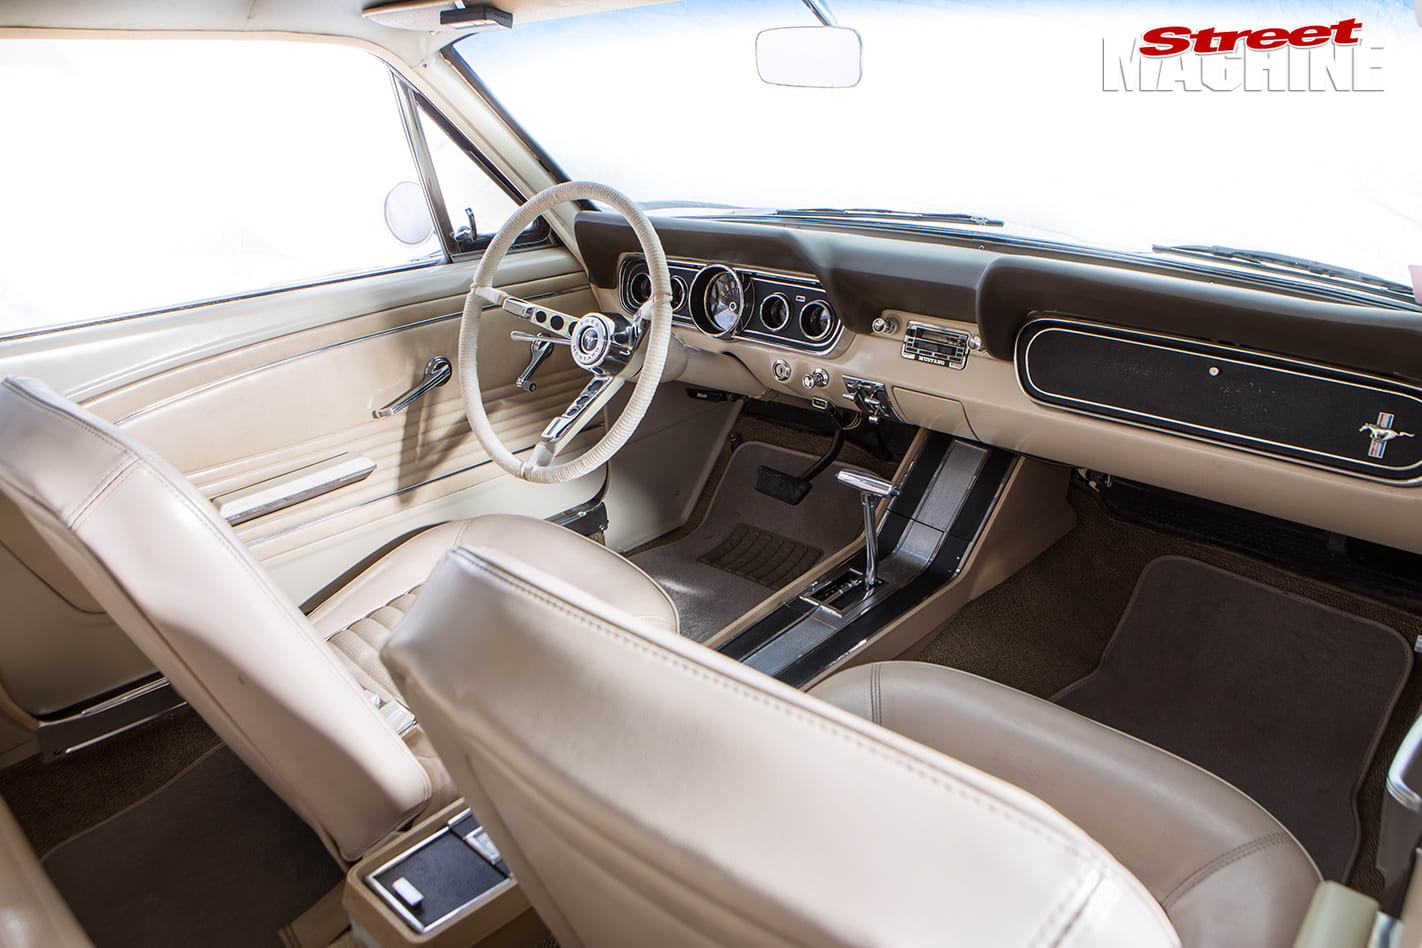 Nicole -Bridge -1966-Mustang -interior